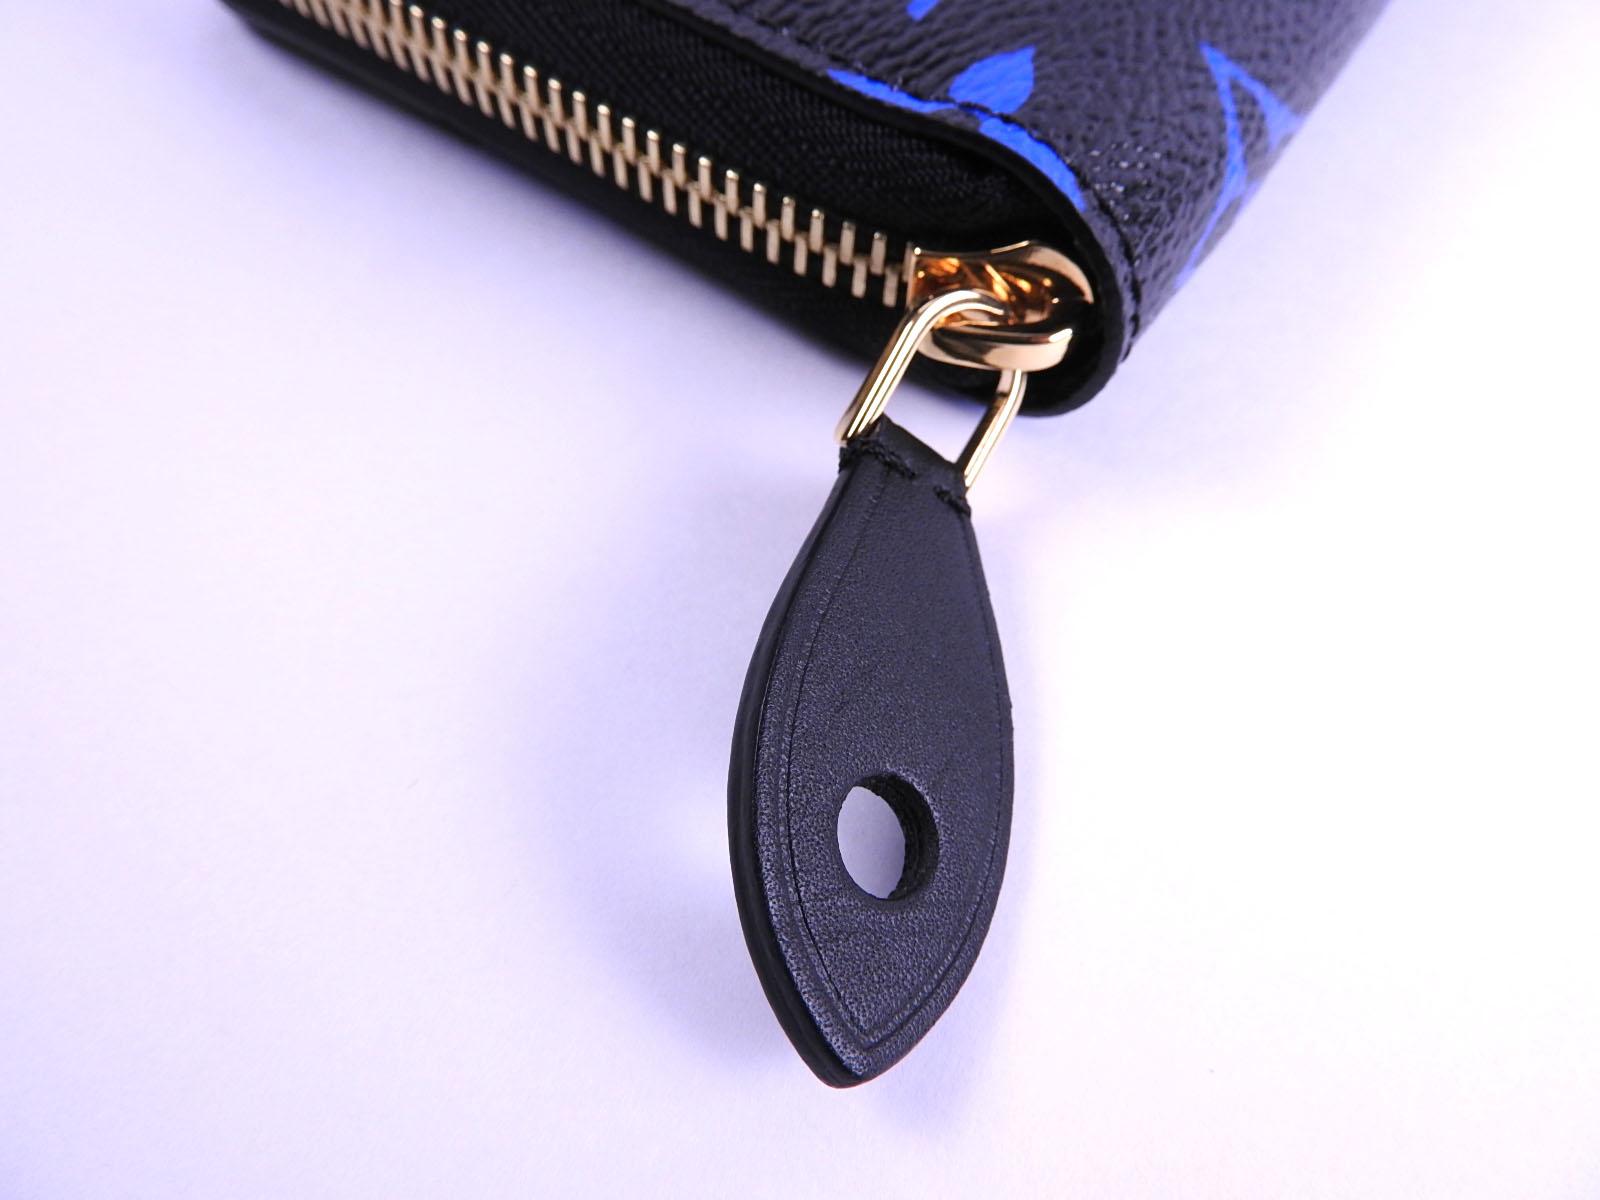 632aef45 LOUIS VUITTON Monogram Blue Zippy Wallet Zip Around Long Wallet M67235  A-8563